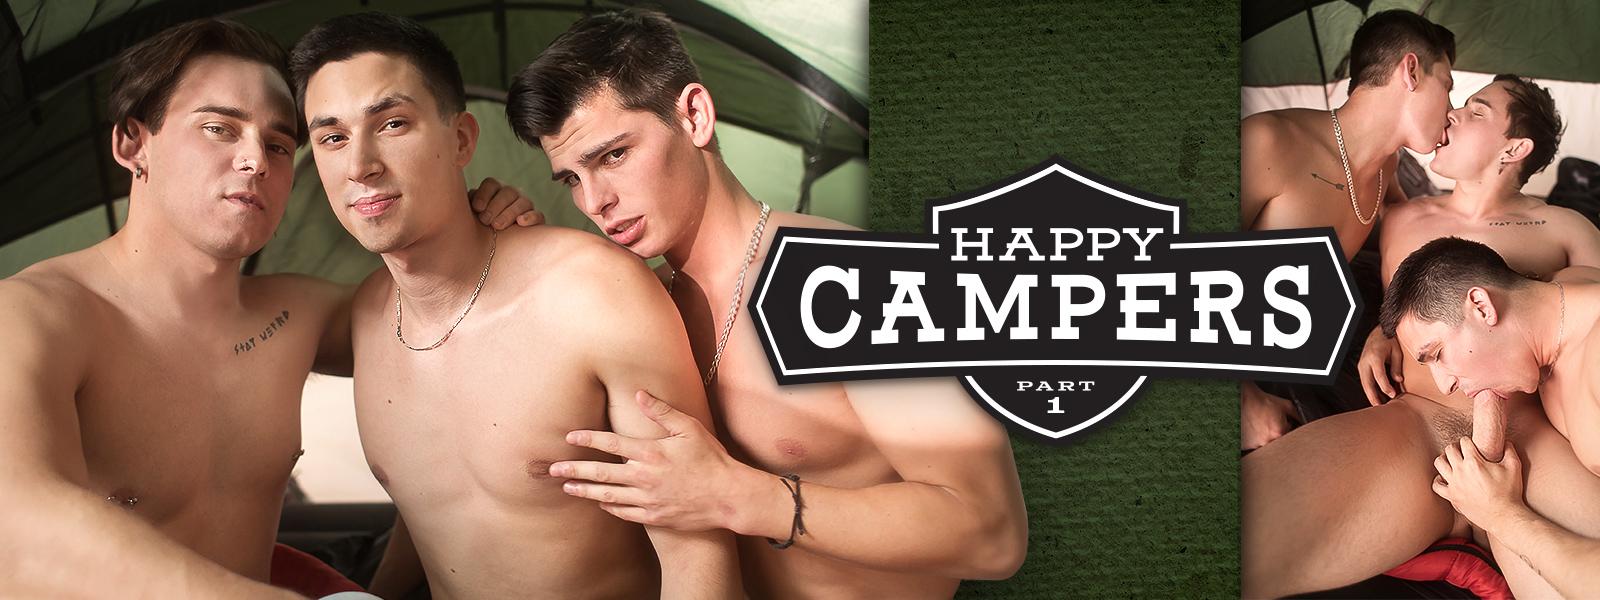 Happy Campers: Part 1